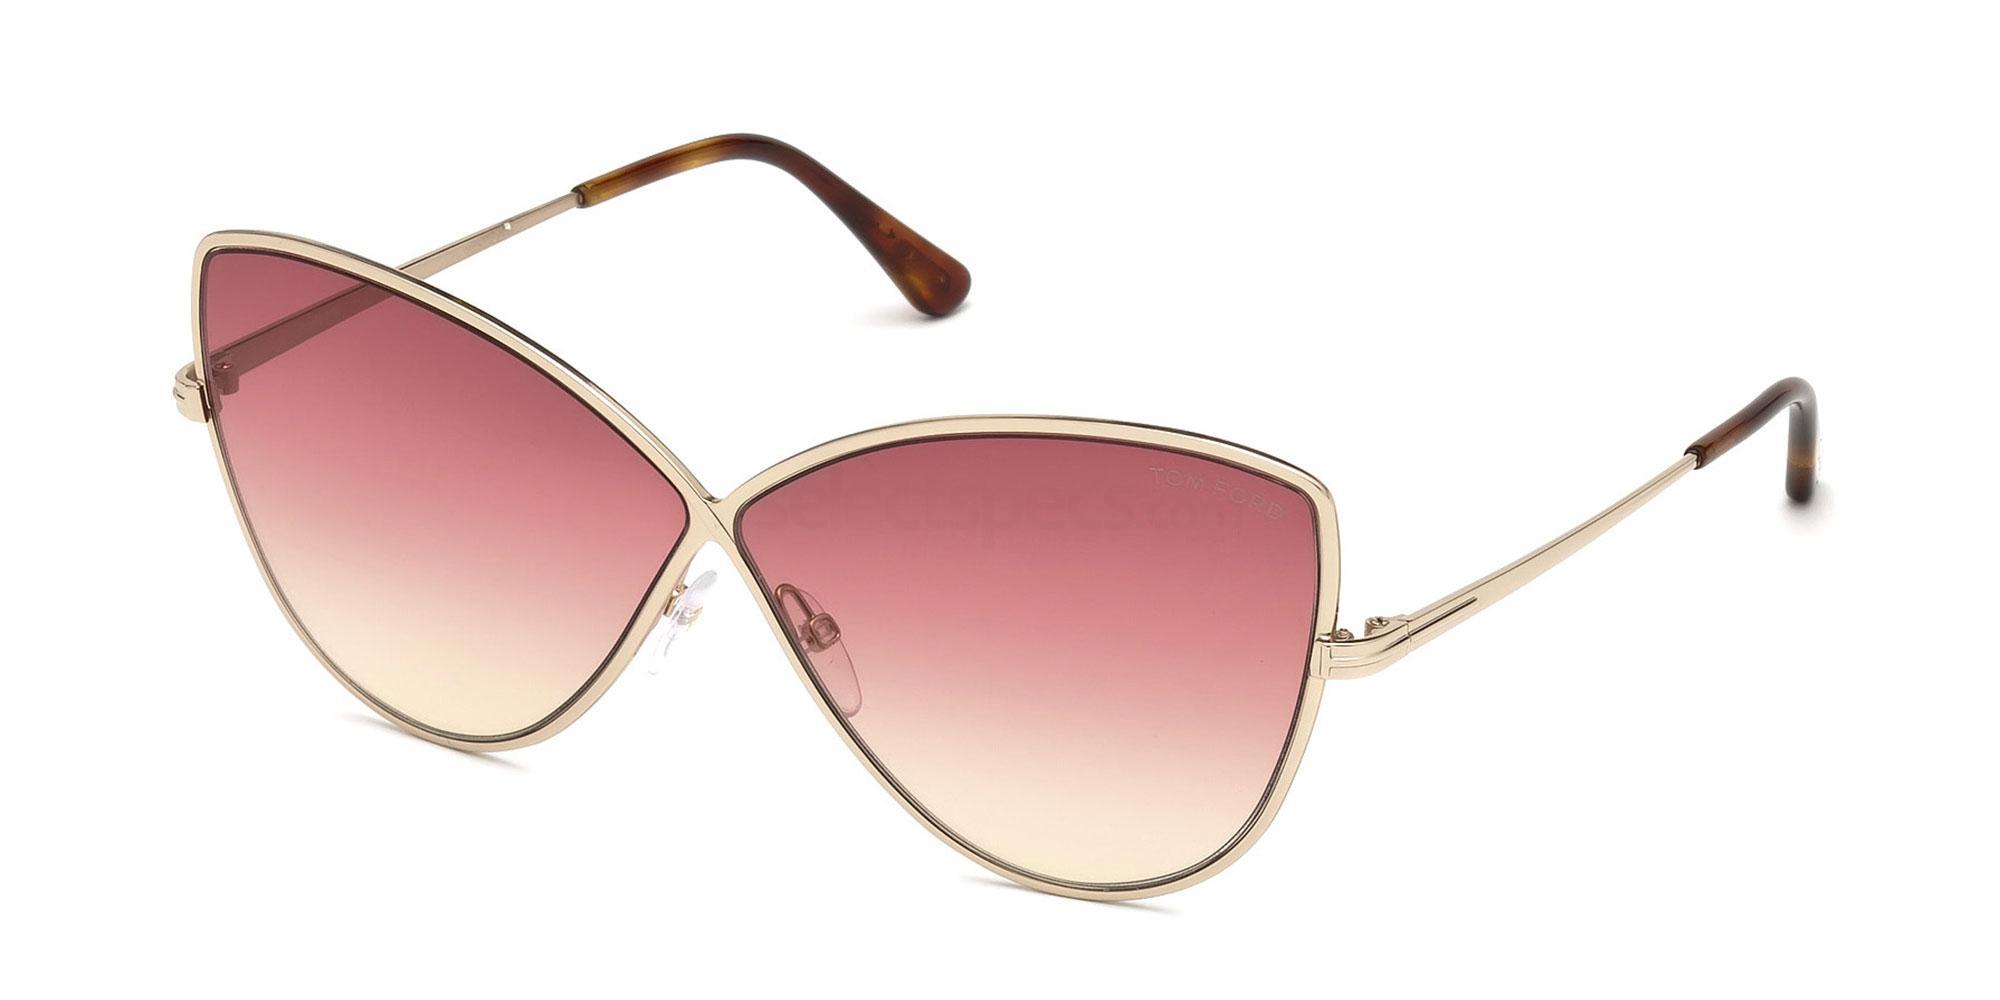 28T FT0569 Sunglasses, Tom Ford